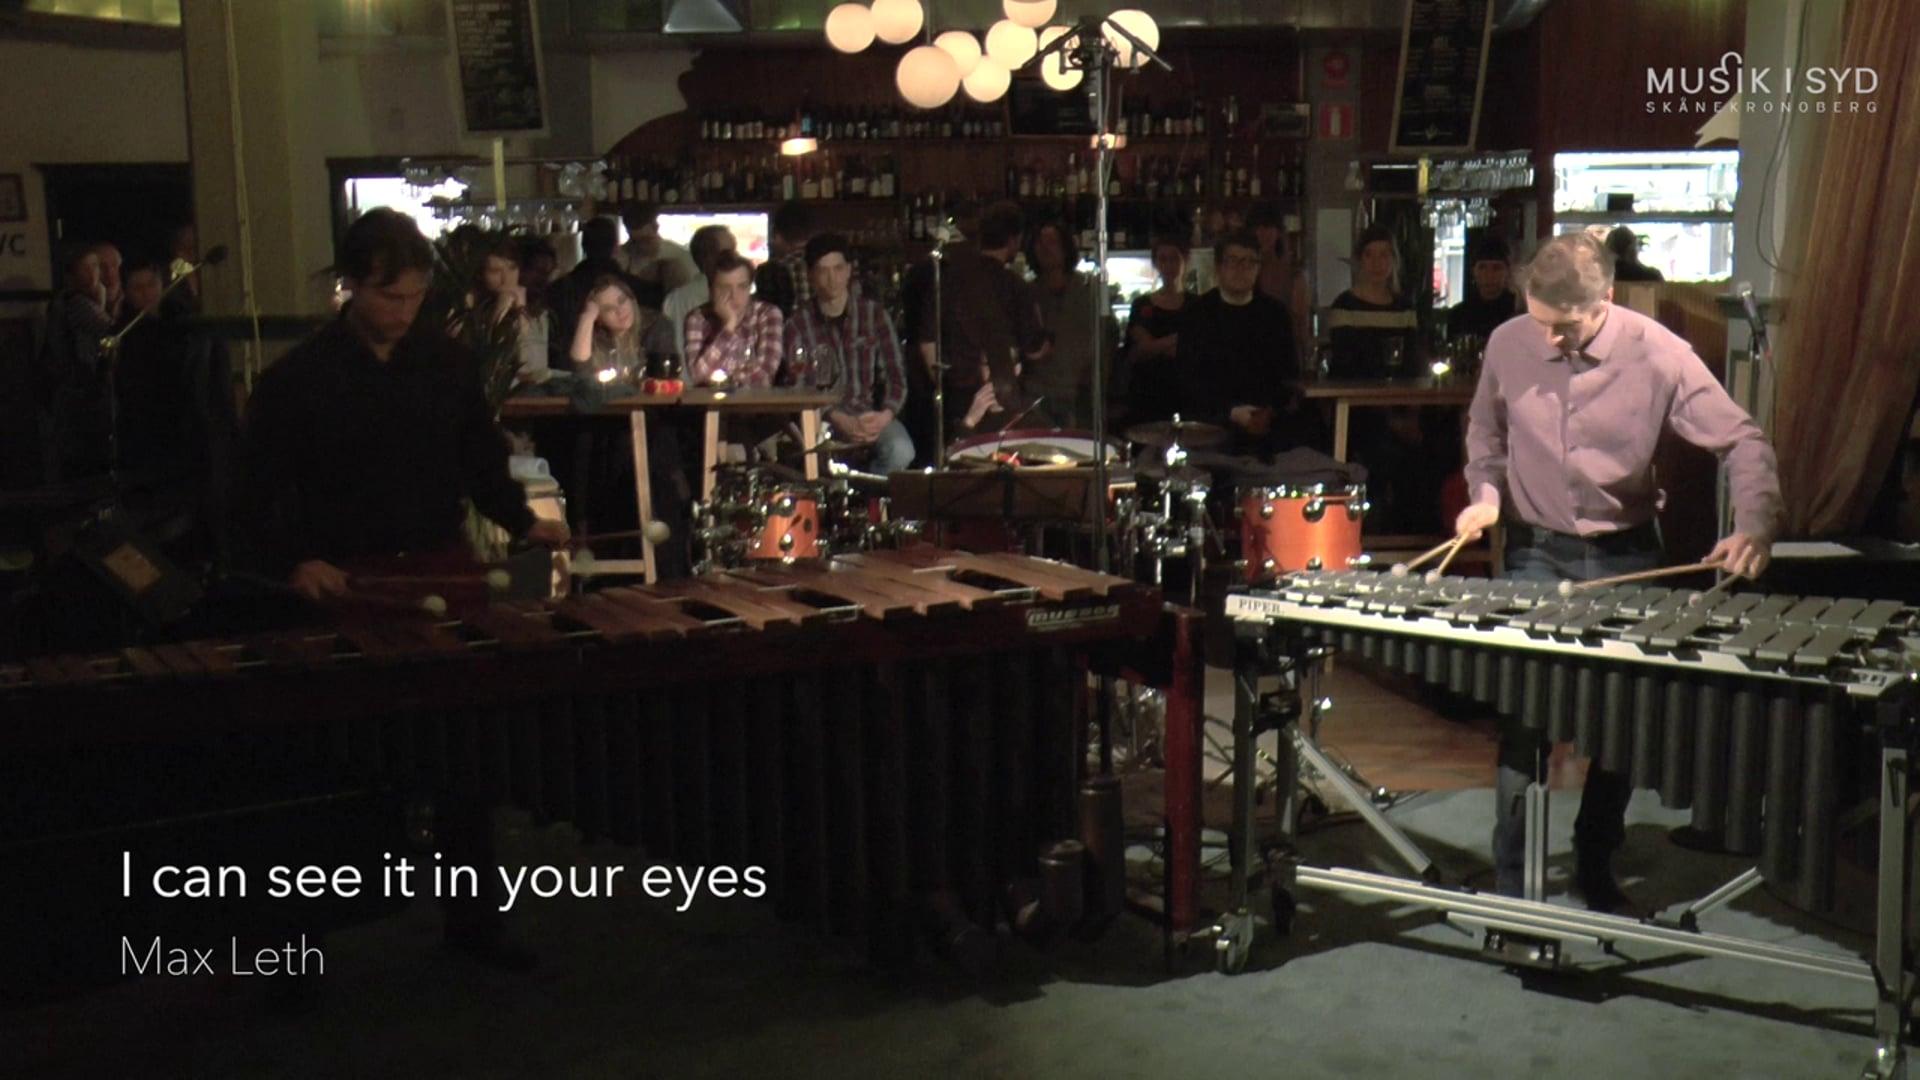 int-musikisyd-klubbkrinolin-20140304-hd720p